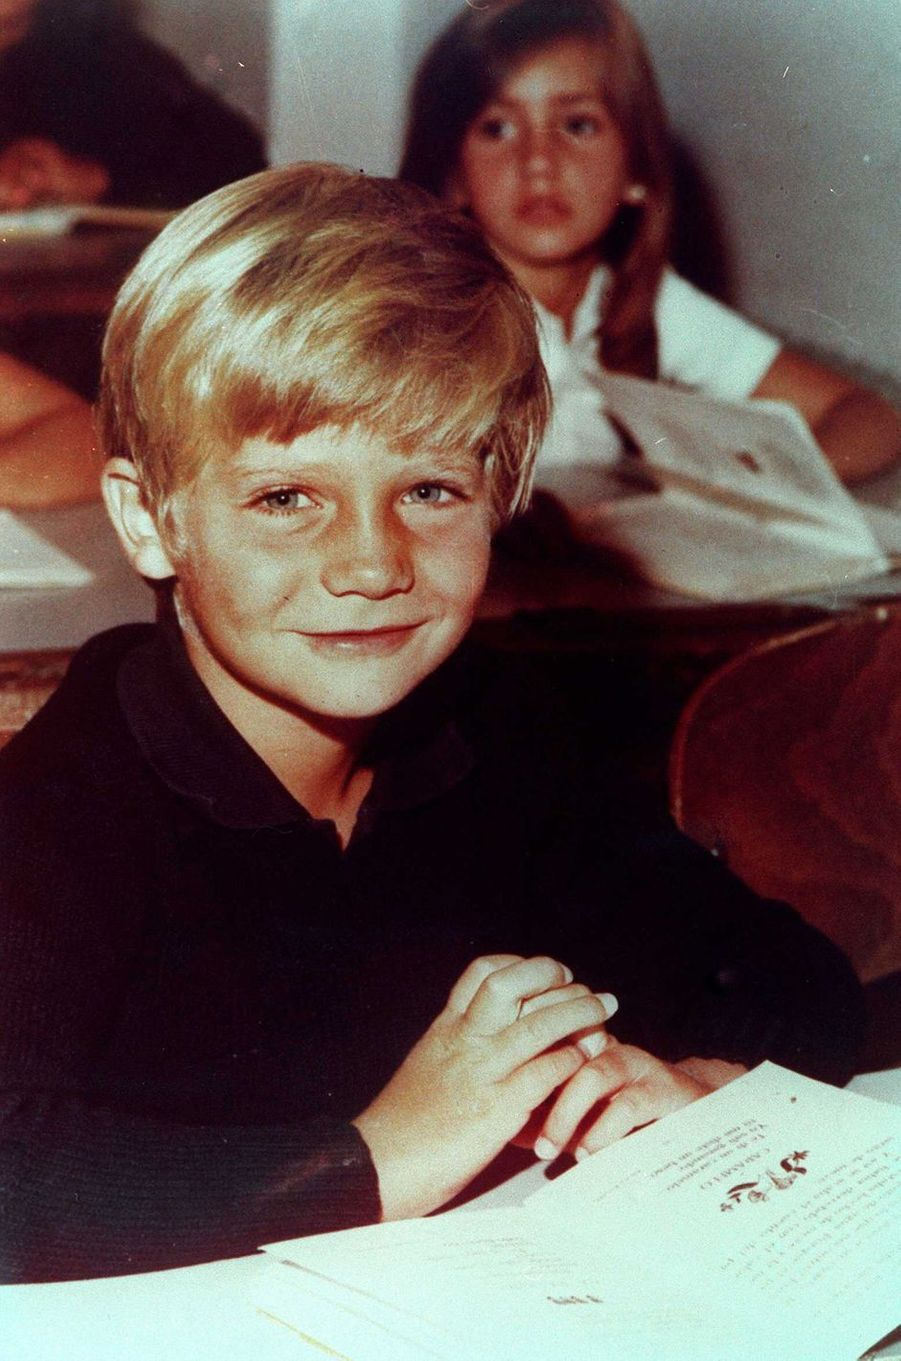 Le prince Felipe d'Espagne, le 26 novembre 1974